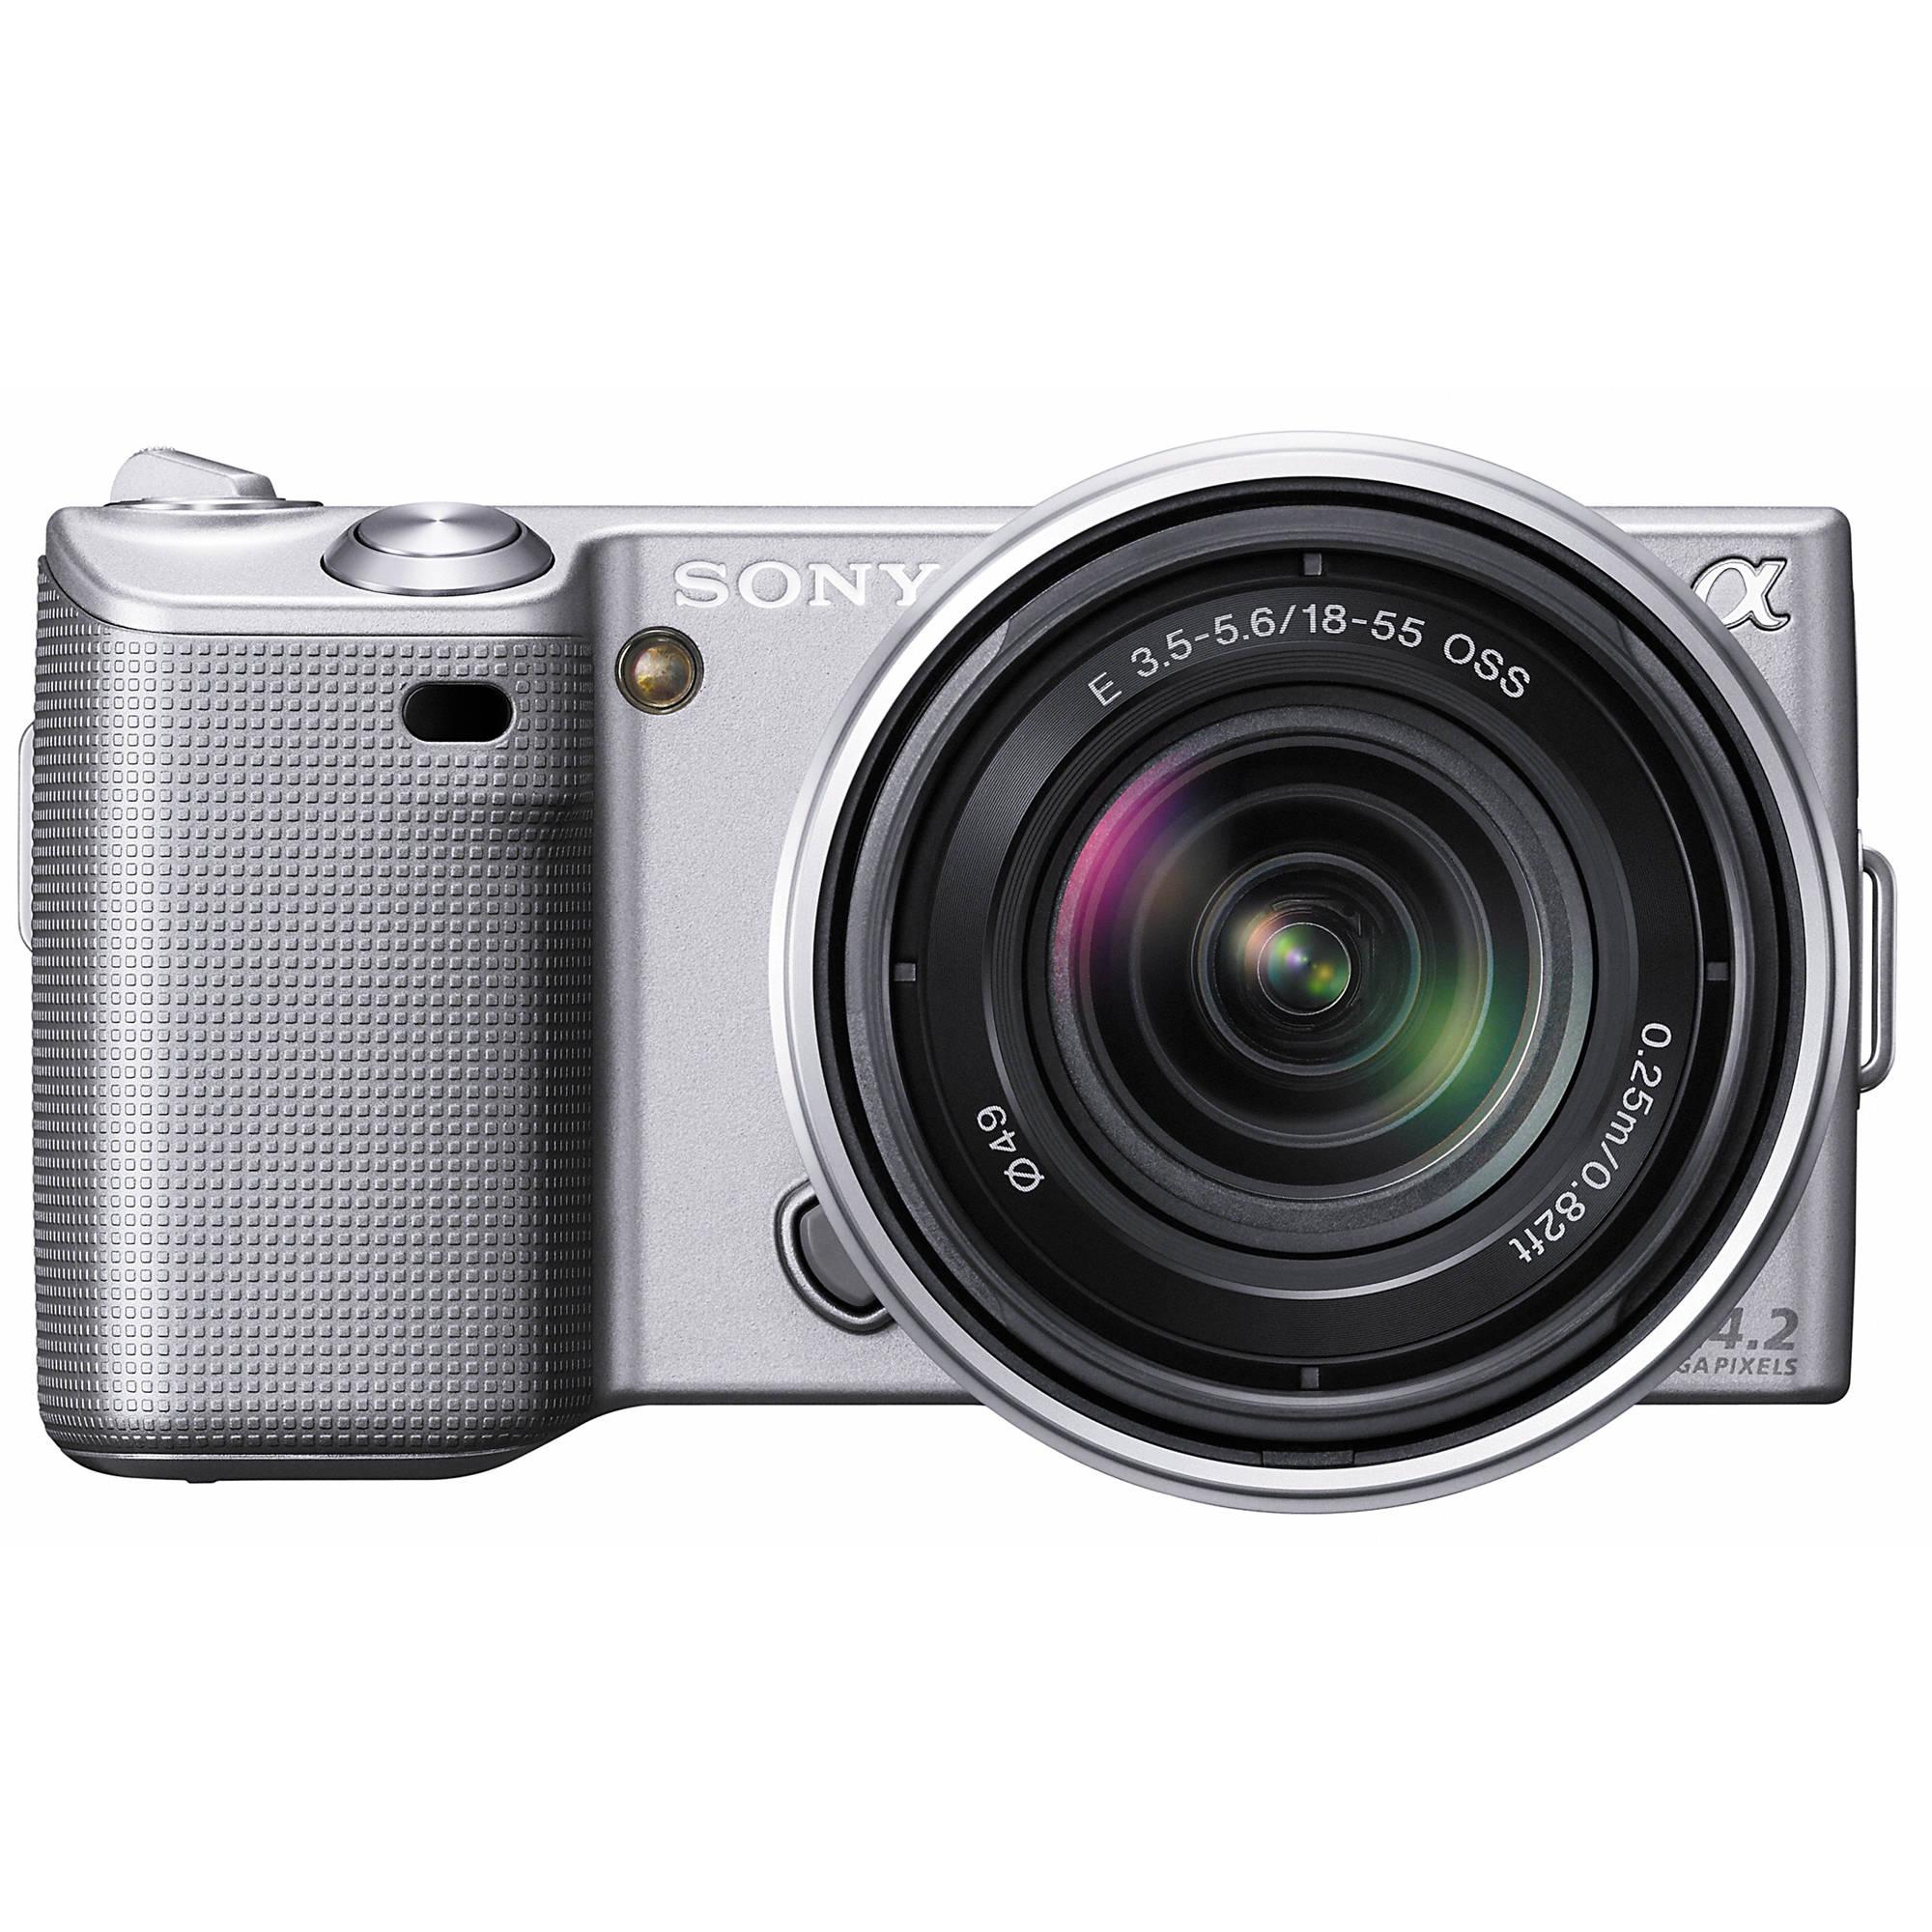 used sony alpha nex 5 interchangeable lens digital nex5k s b h rh bhphotovideo com sony nex 5 manual pdf sony nex 5 manual